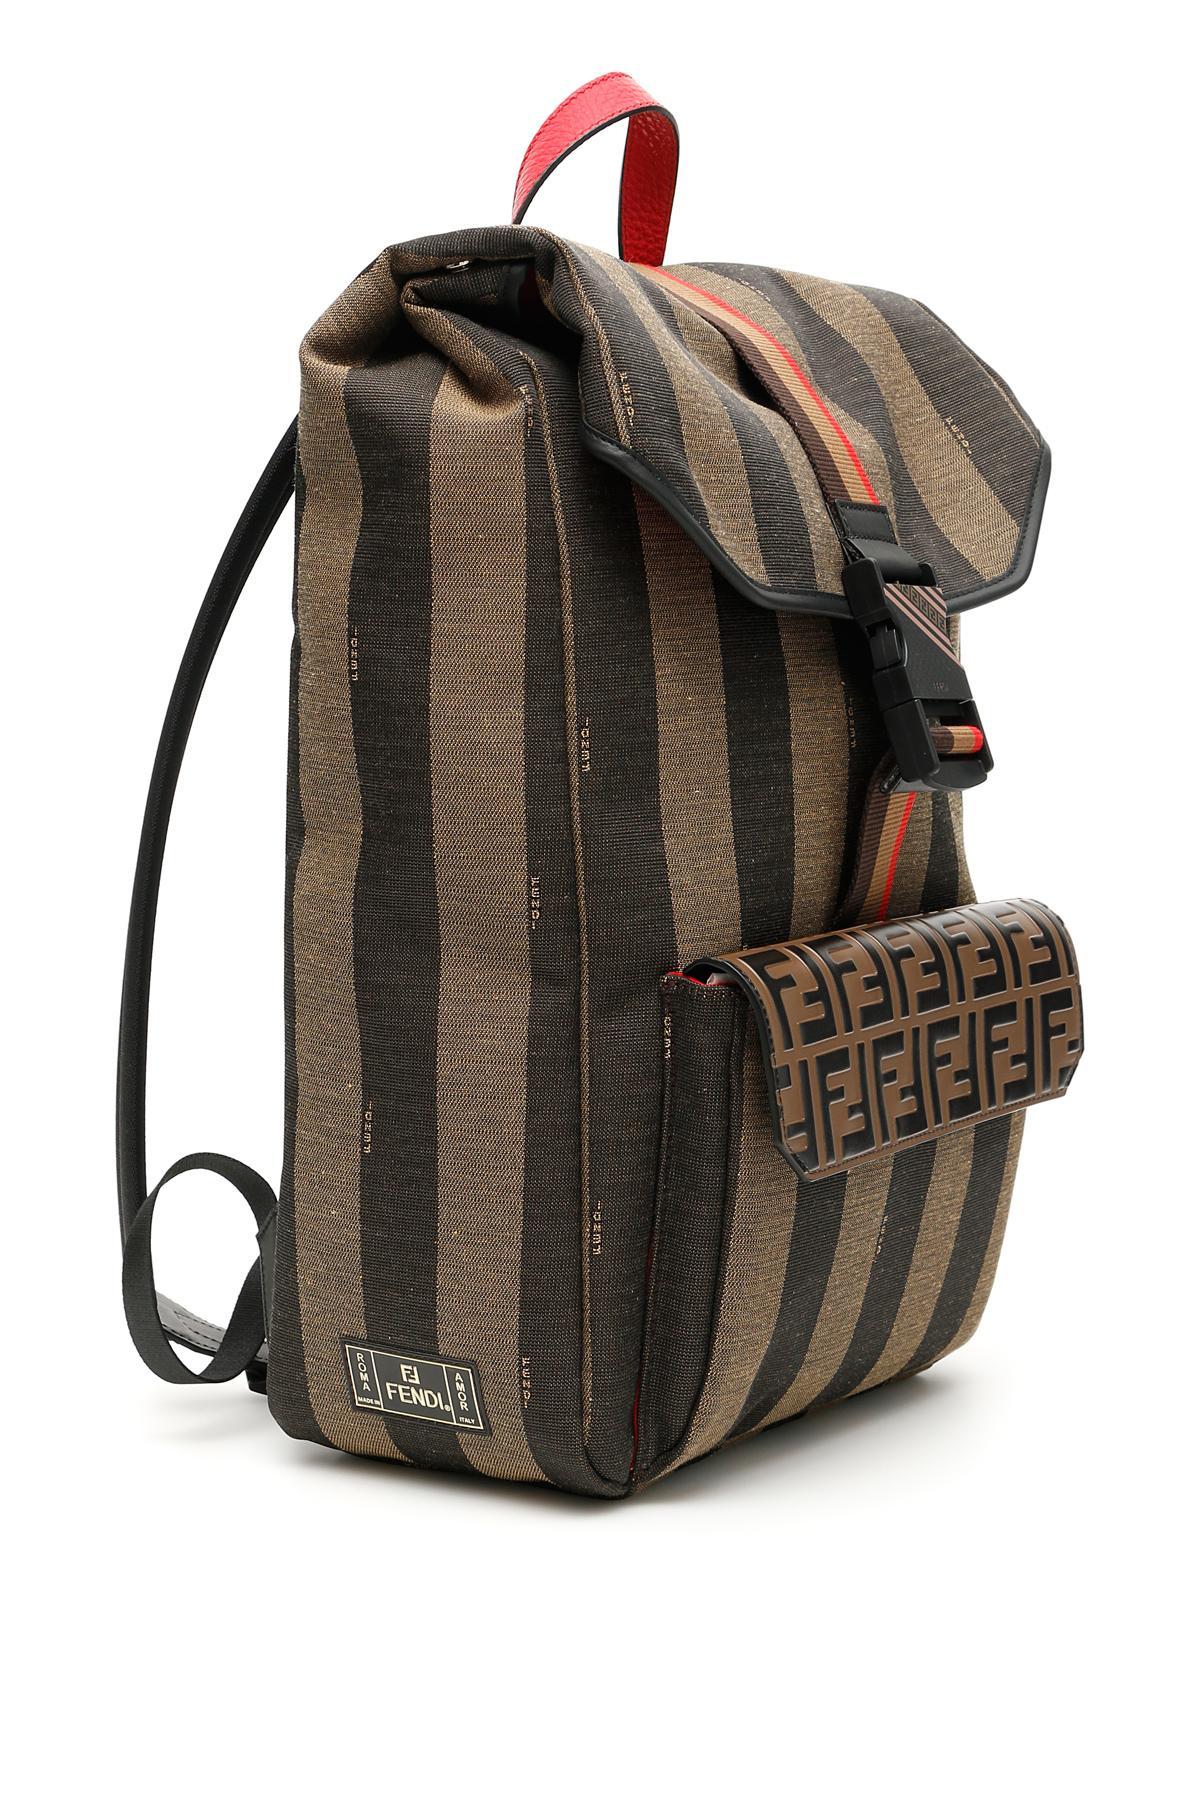 7d018117d2e7 Fendi - Multicolor Ff Striped Canvas Backpack for Men - Lyst. View  fullscreen